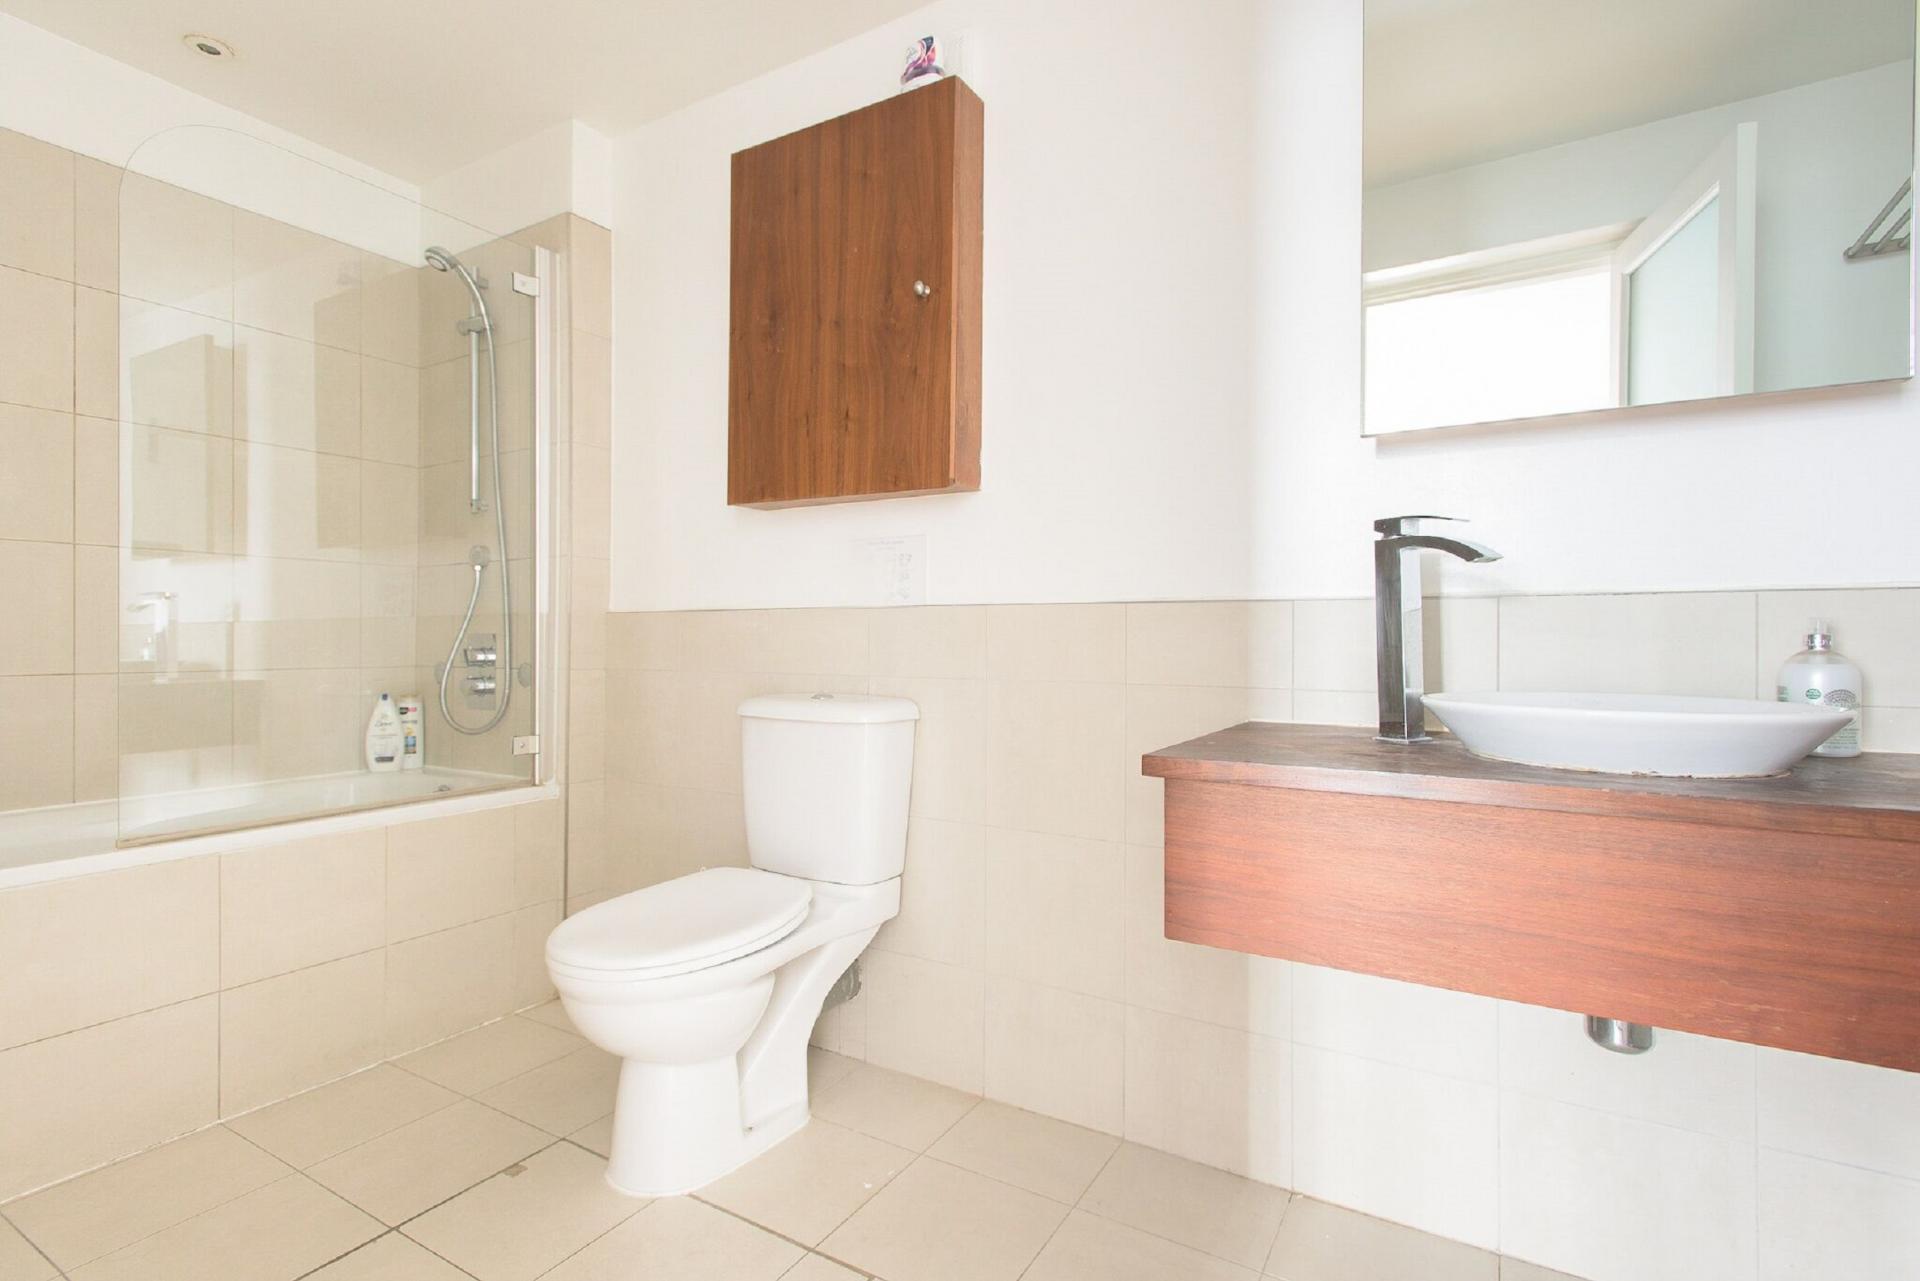 Toilet at The Paddington Maisonette, Paddington, London - Citybase Apartments